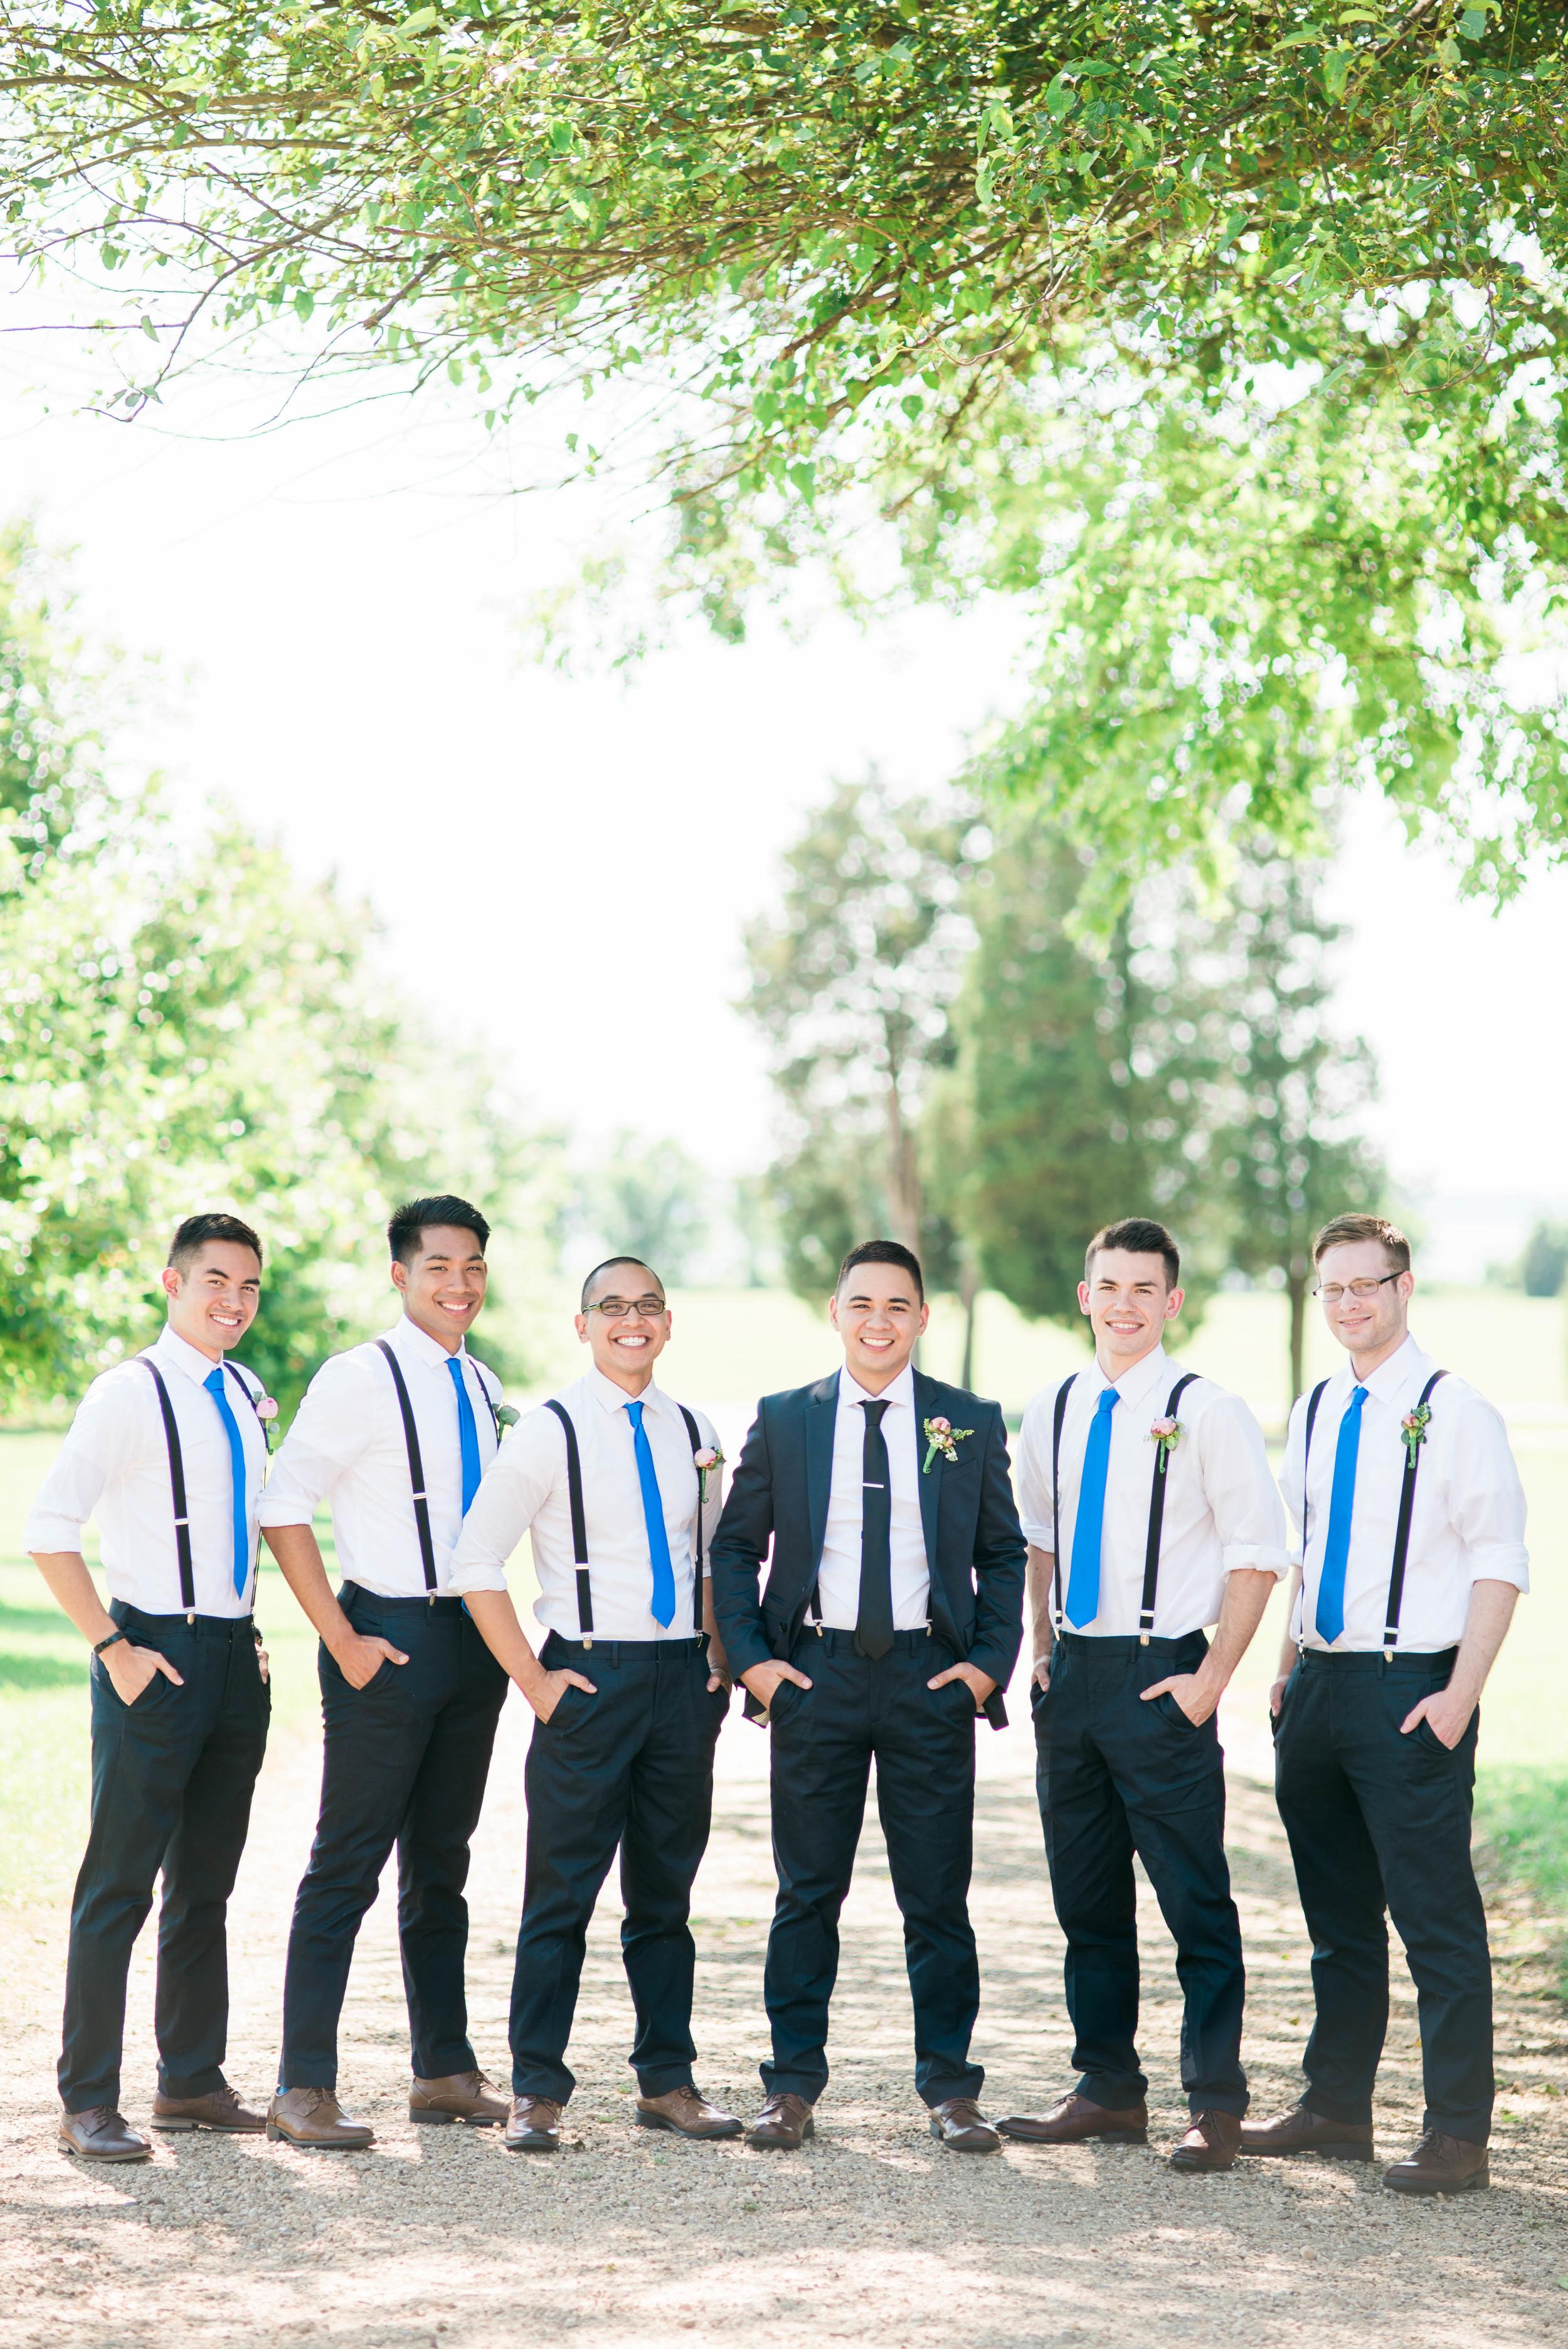 PREVIEWremowedding2016v2-5.jpg